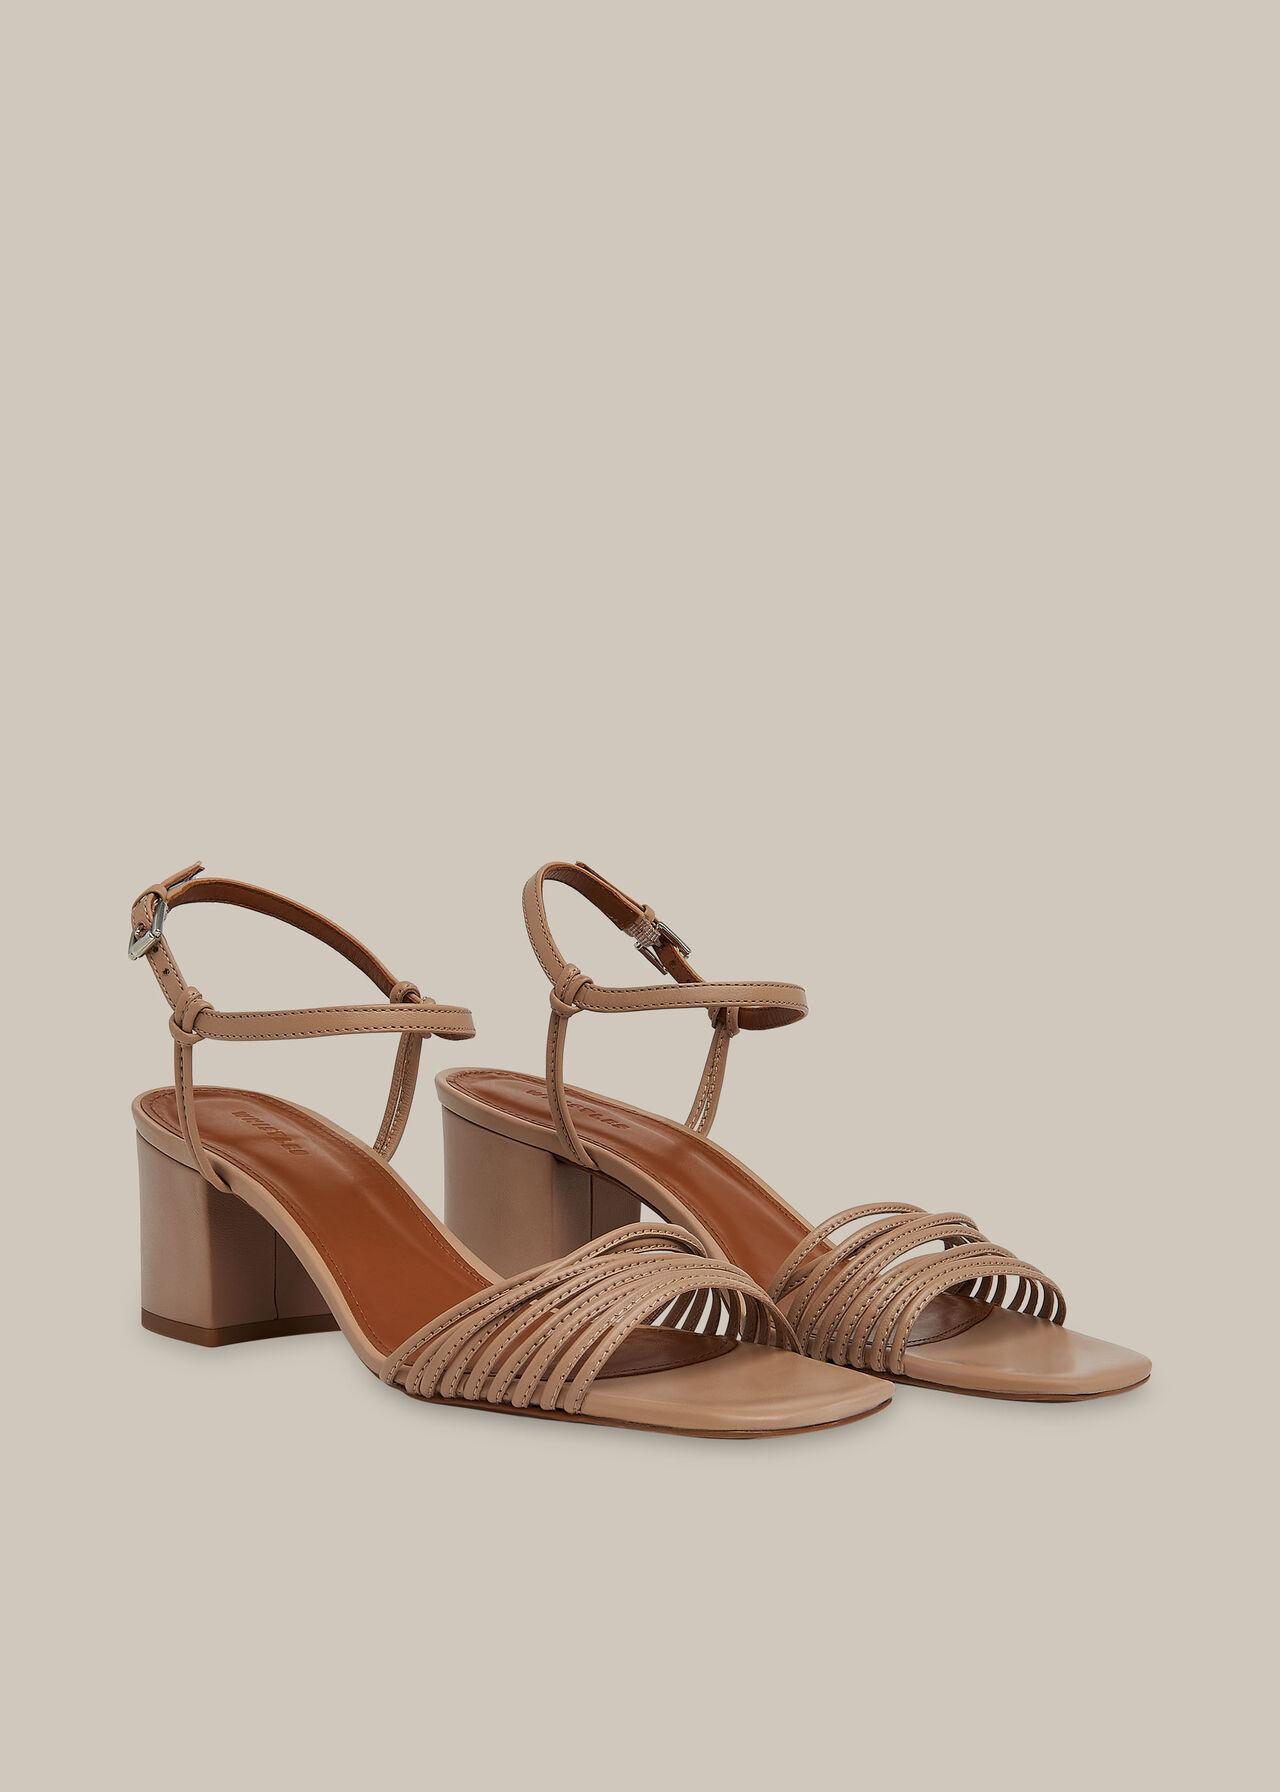 Hana Multi Strap Sandal NUDE